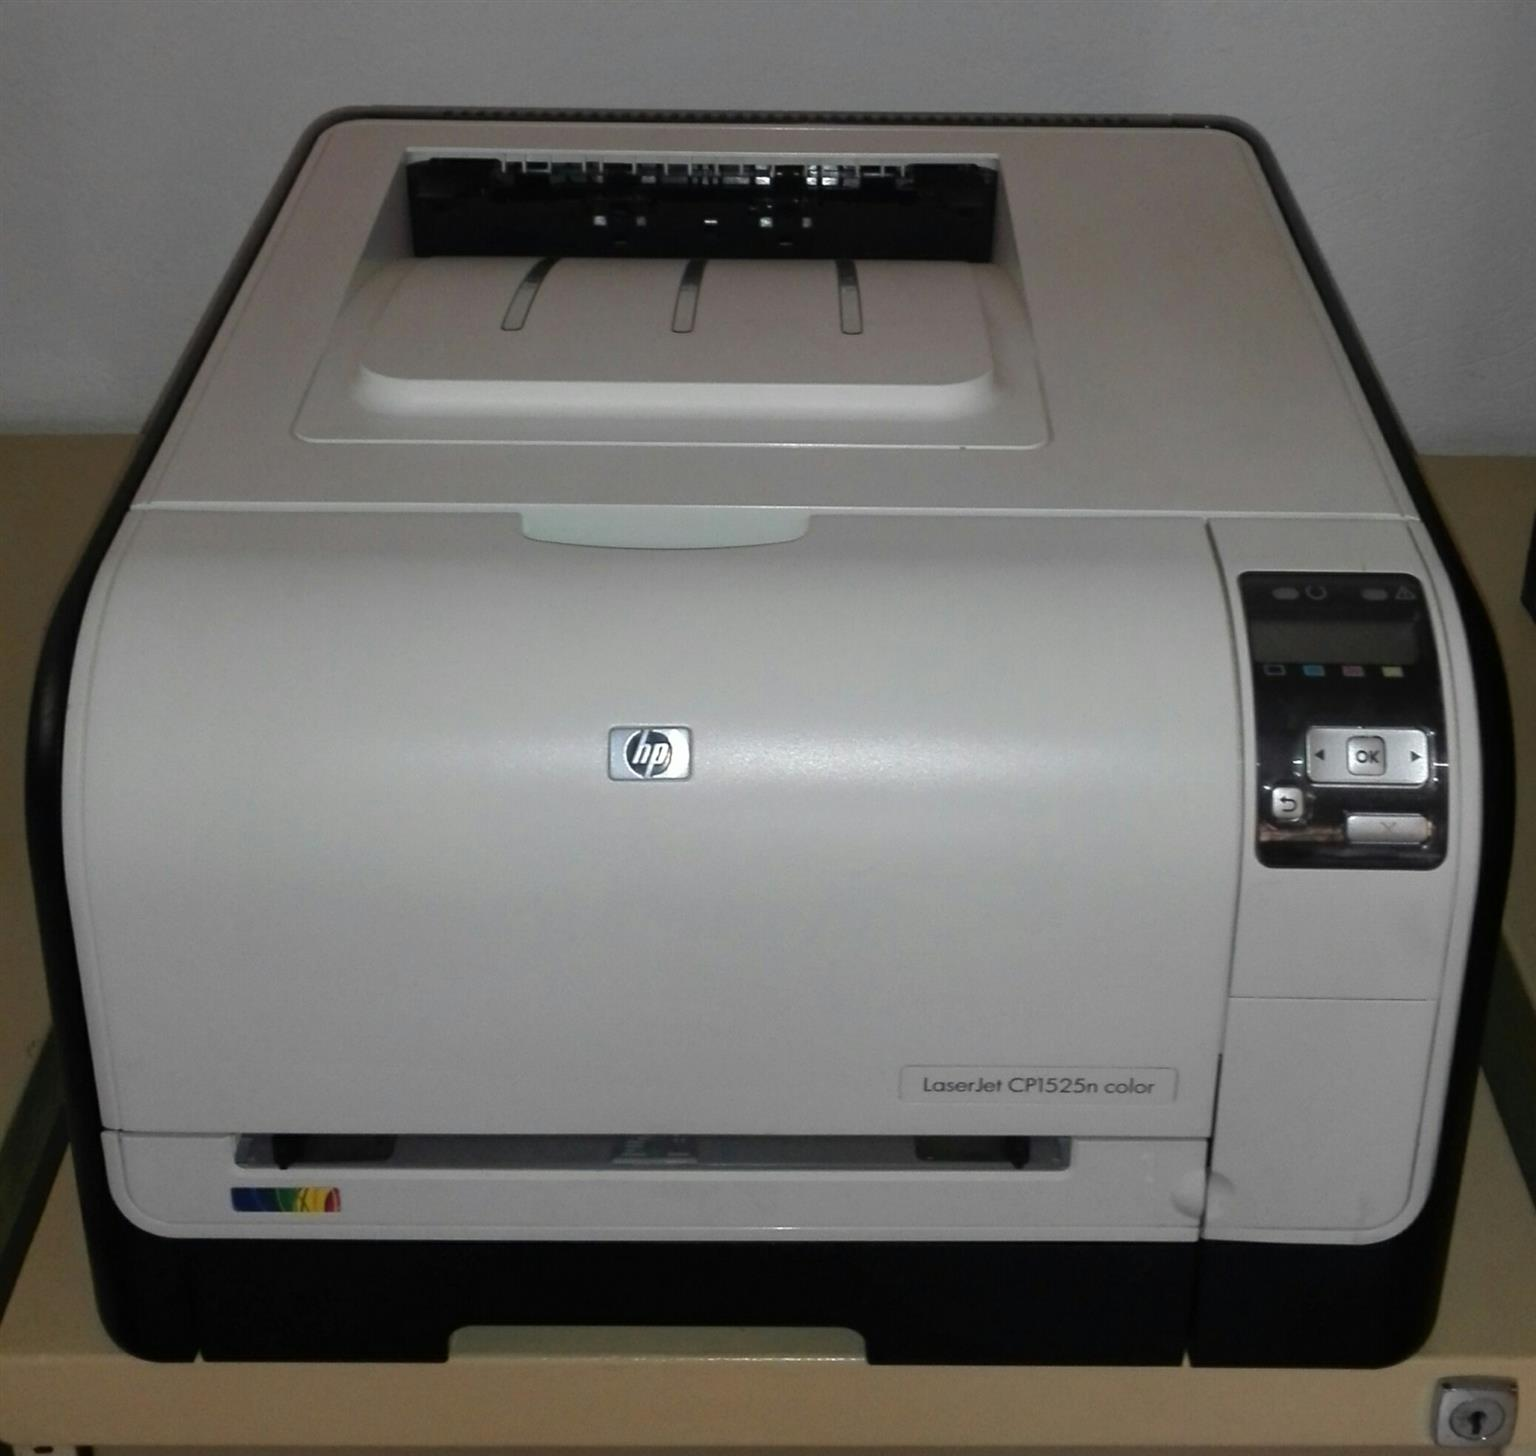 HP LJ CP1520 WINDOWS 8 X64 DRIVER